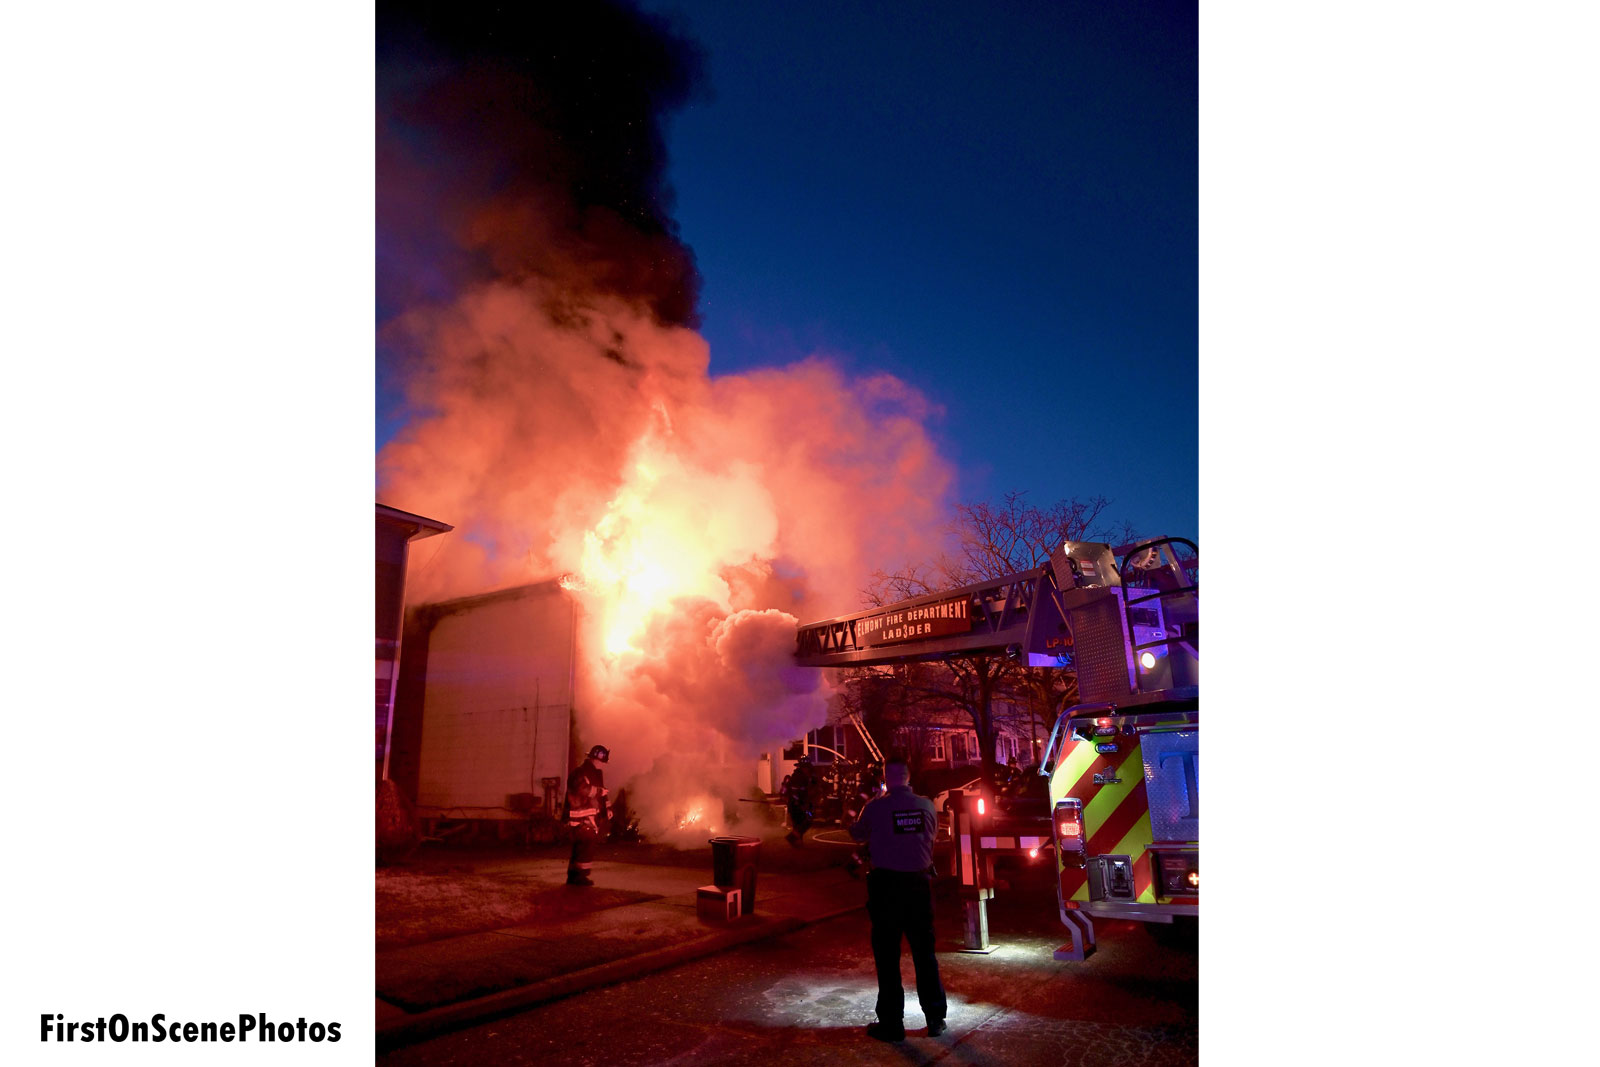 Elmont Fire Department Ladder 3 put into service